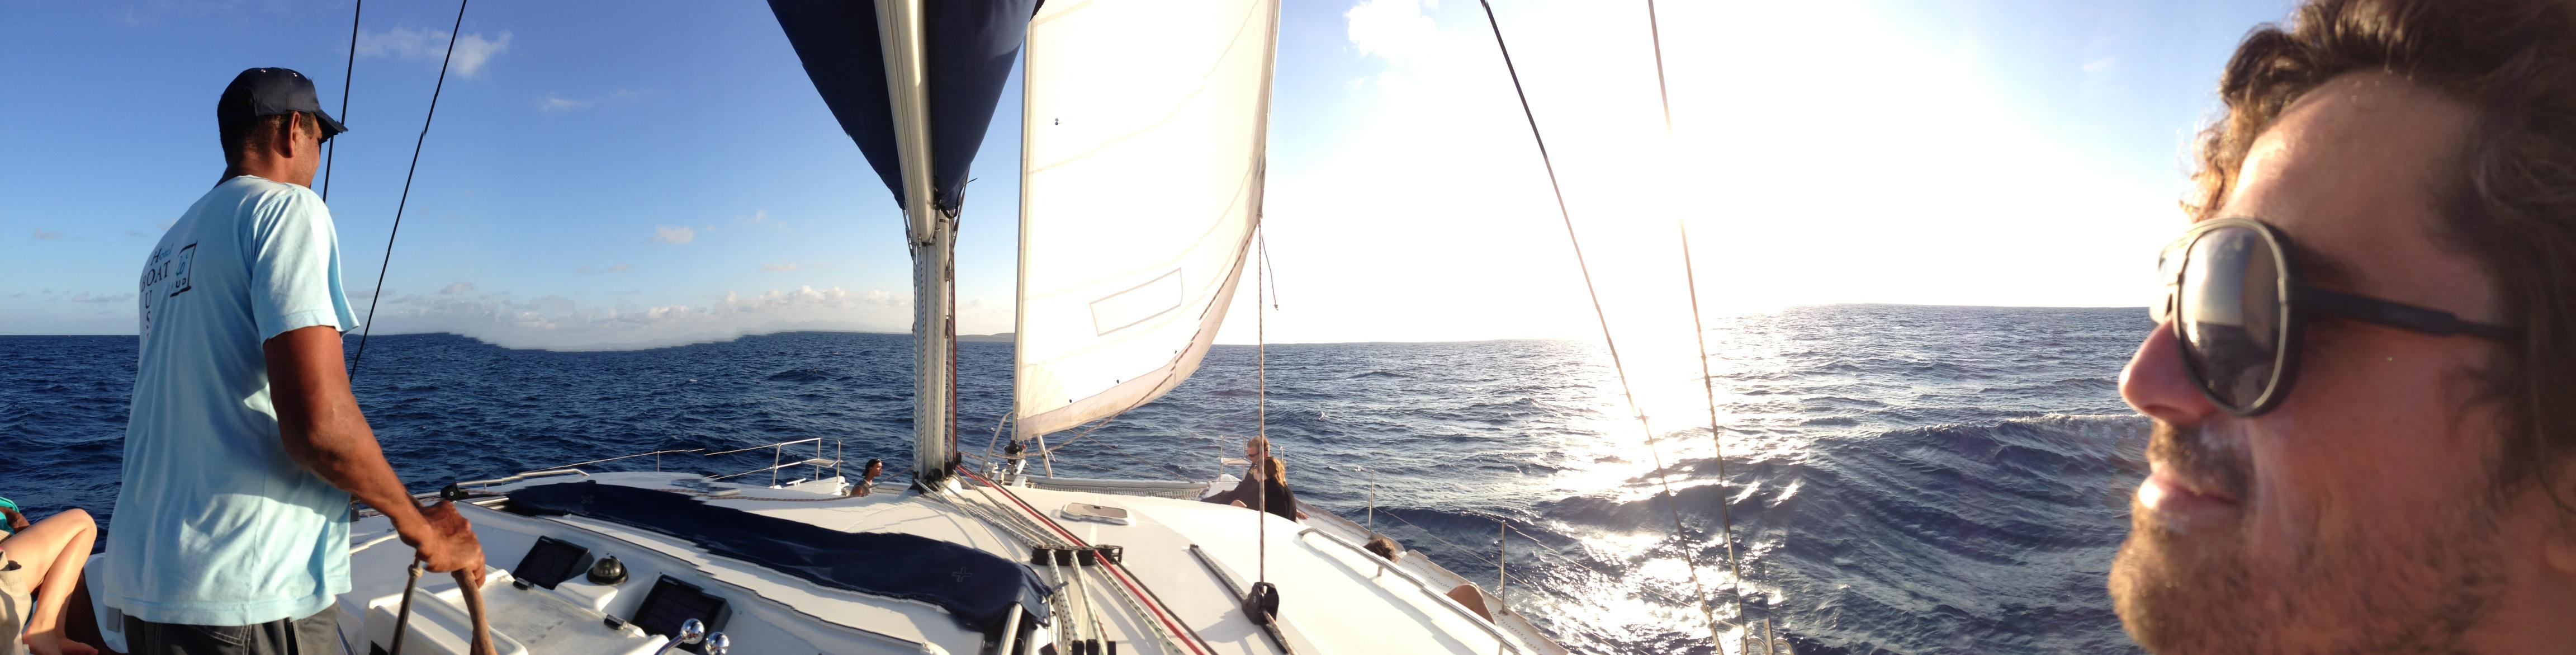 Panoramique Ile maurice - Retour de l'ile plate